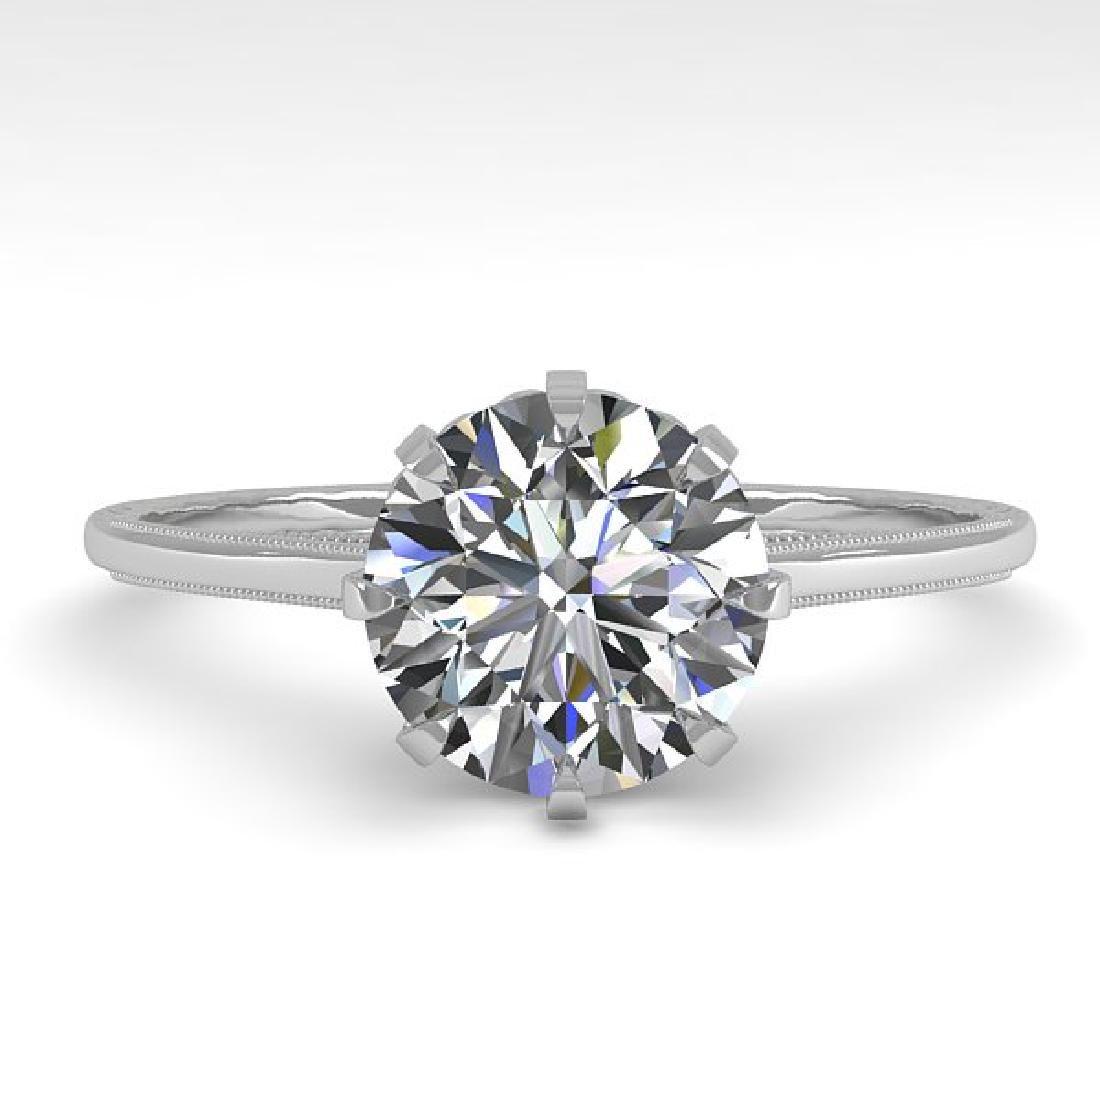 1.51 CTW Certified VS/SI Diamond Ring 14K White Gold